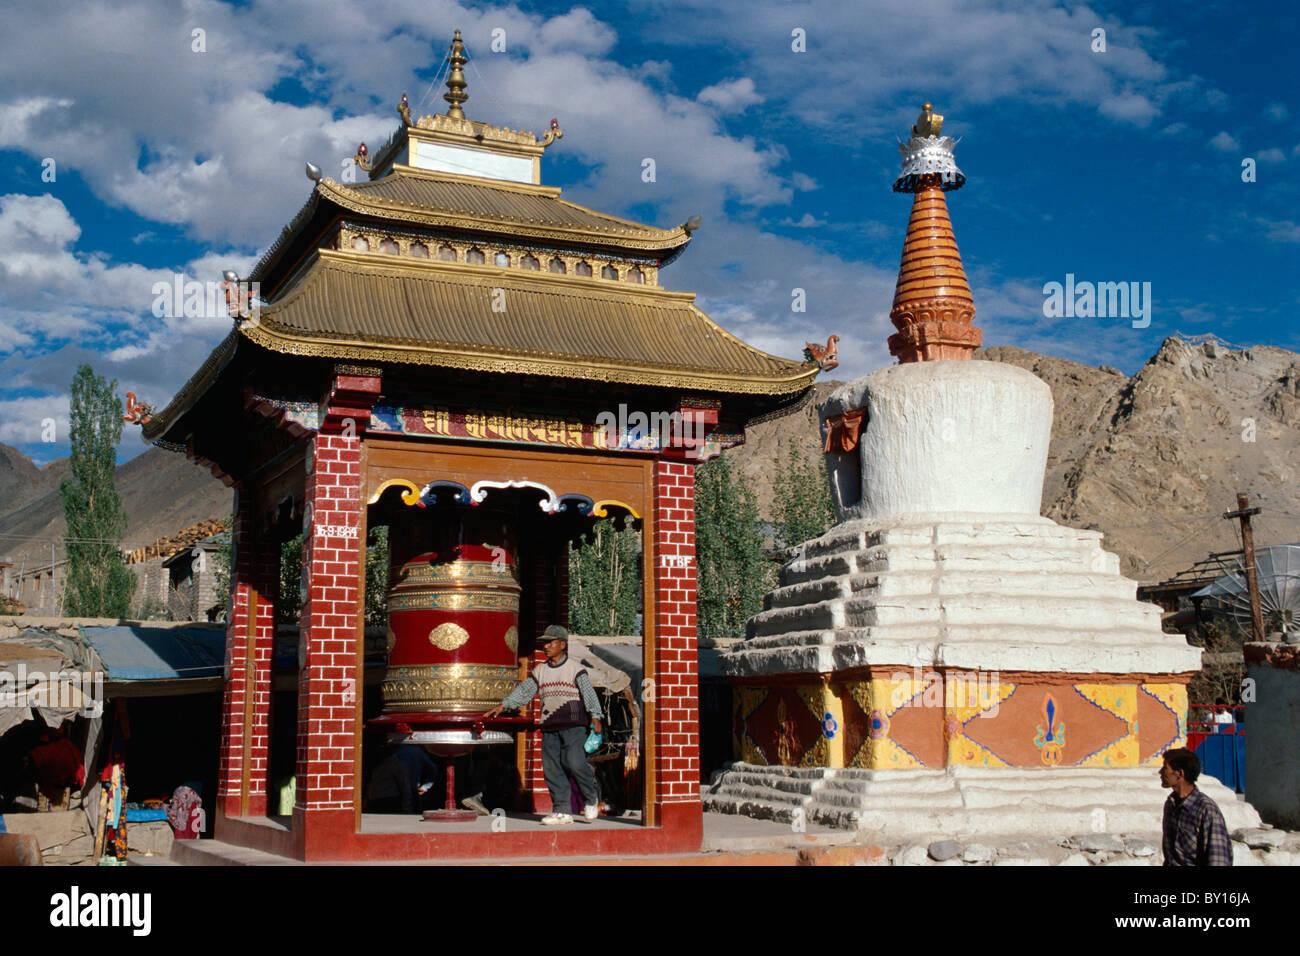 Stupa and prayer wheel in Leh, Ladakh (Jammu+Kashmir), Indiia Stock Photo